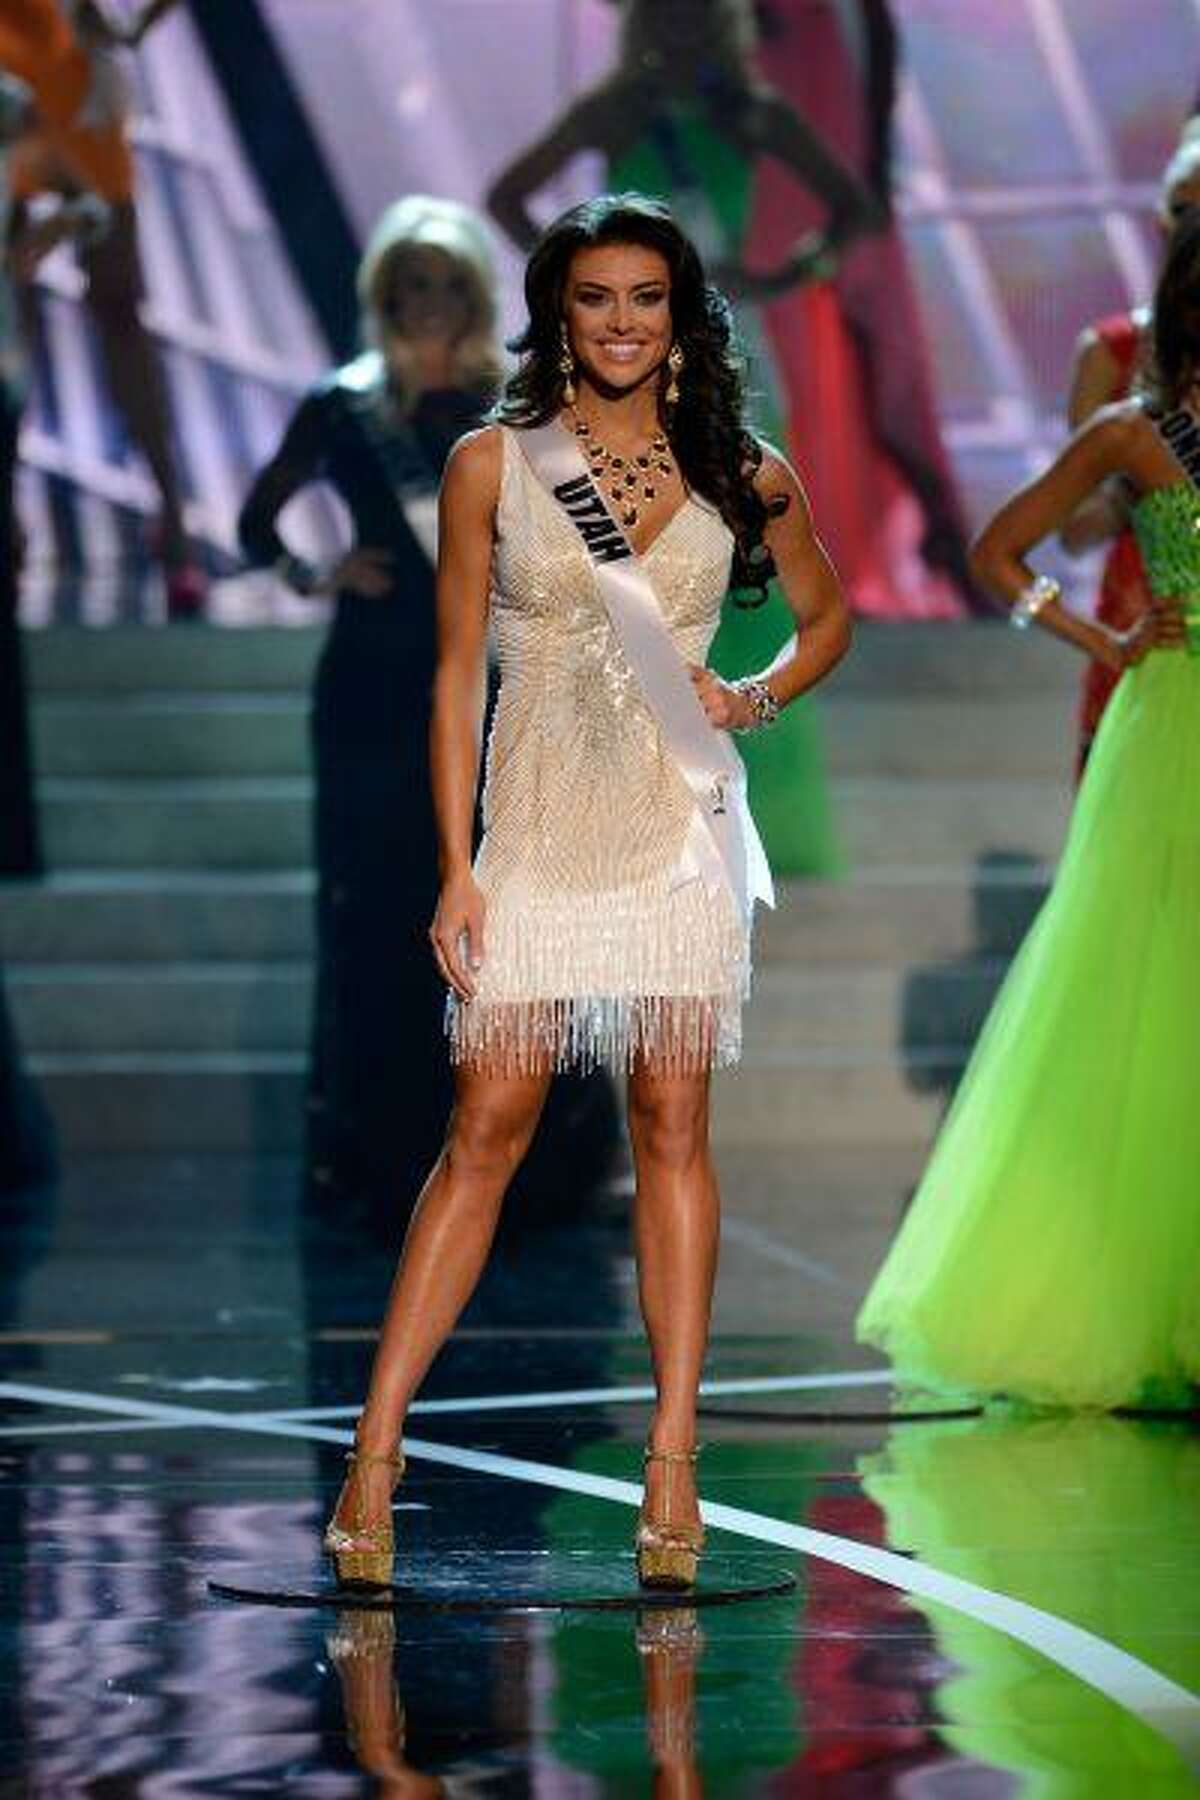 Miss Utah Marissa Powell walks onstage during the Miss USA 2013 pageant, Sunday, June 16, 2013, in Las Vegas. (AP Photo/Jeff Bottari)